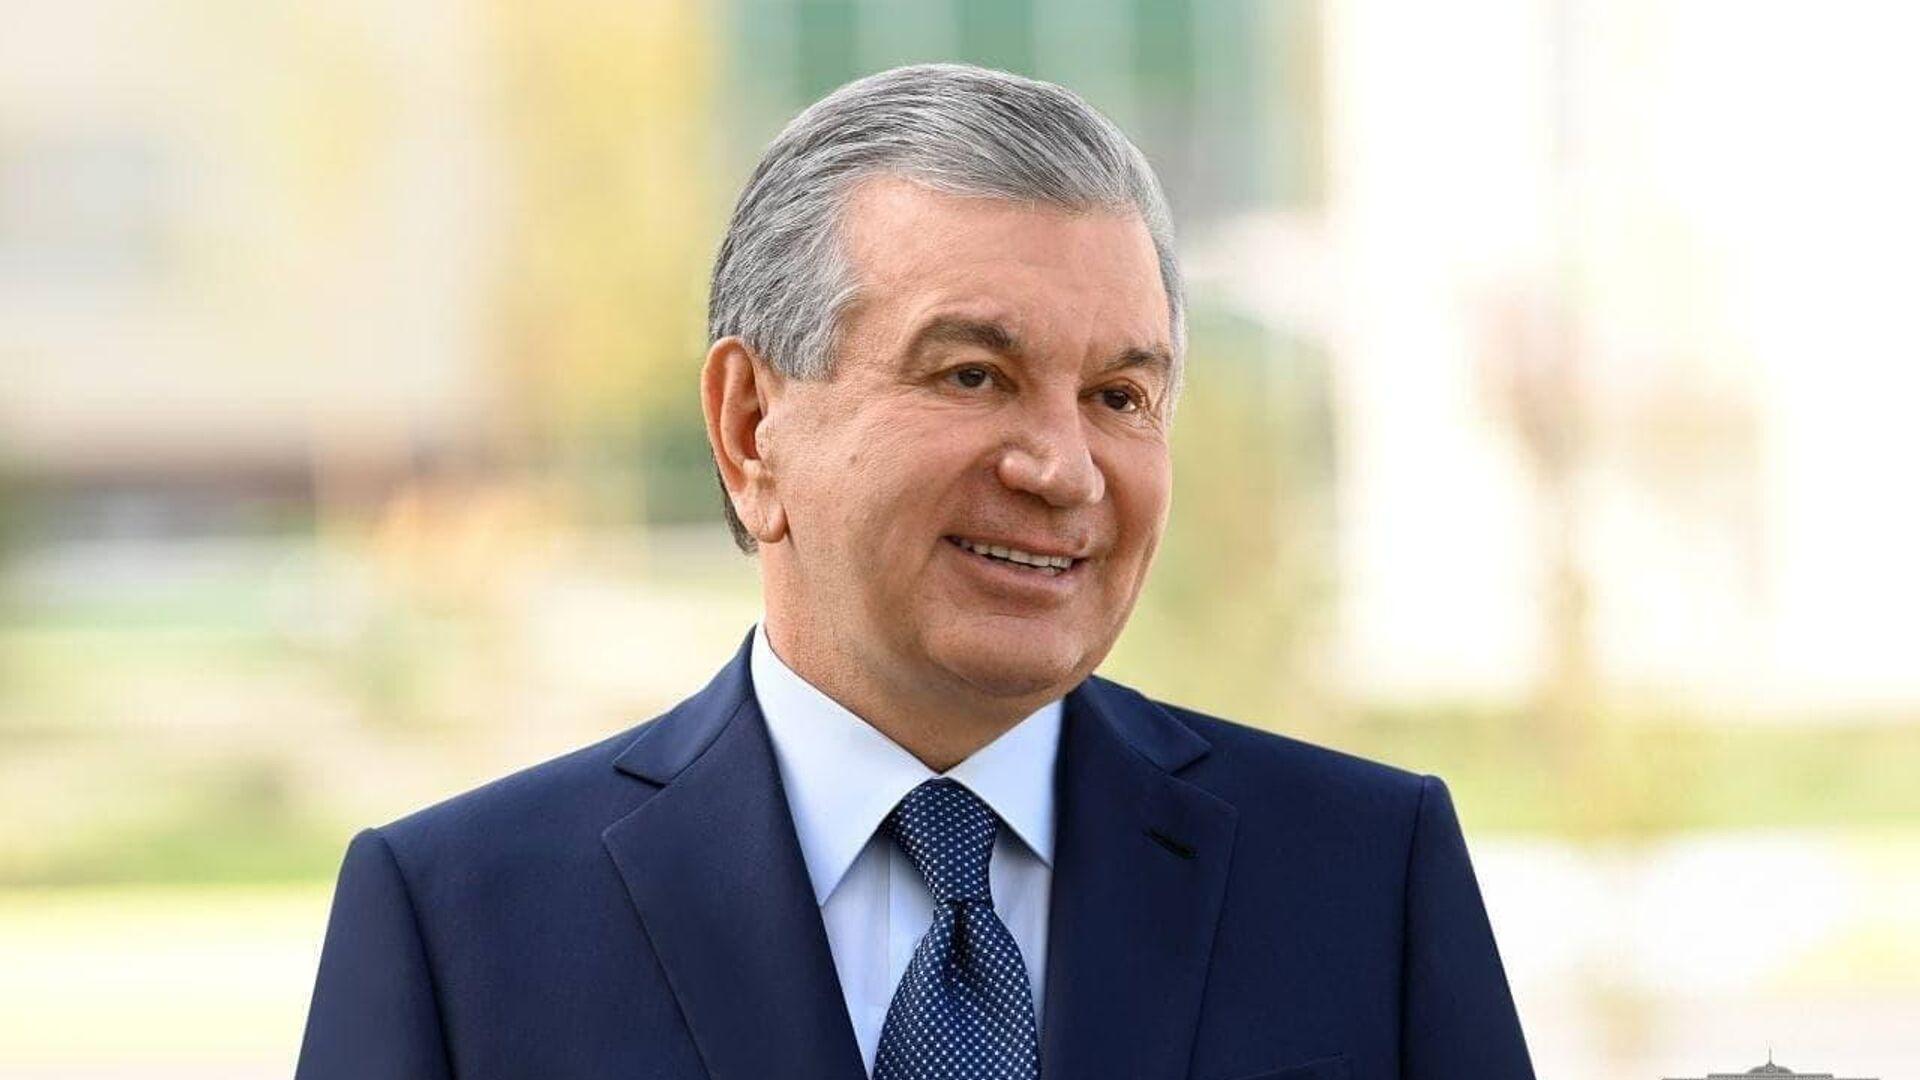 Президент Узбекистана Шавкат Мирзиёев - Sputnik Ўзбекистон, 1920, 30.09.2021